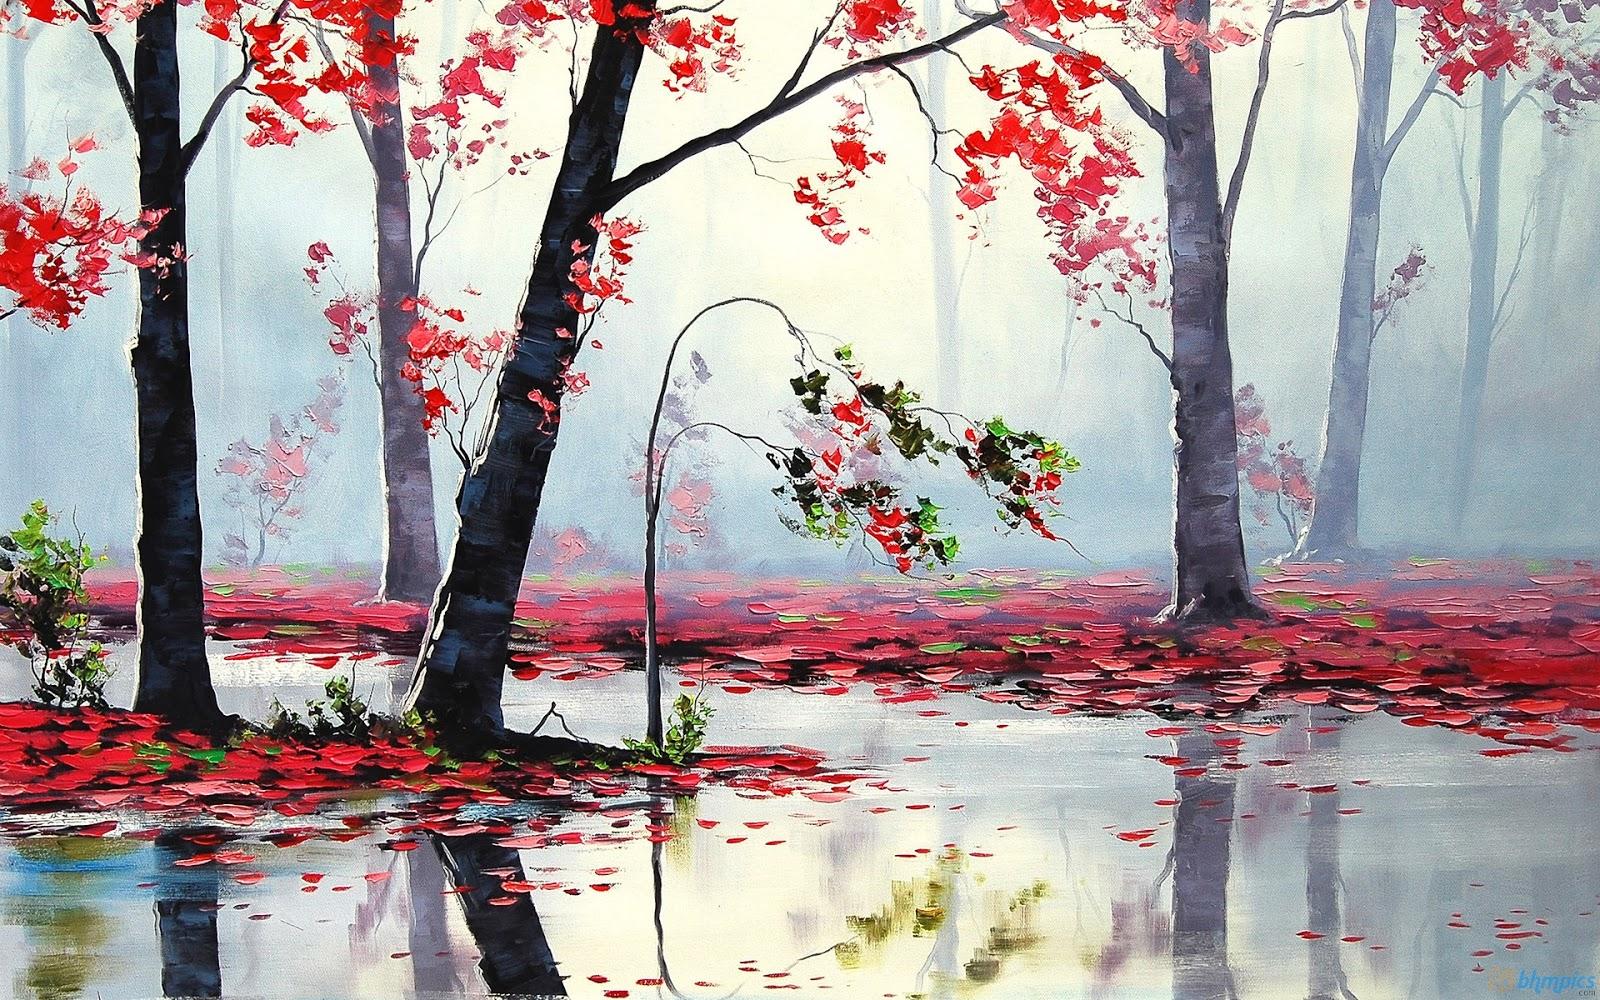 http://3.bp.blogspot.com/-DEShoJdHu2M/UHjivduJIzI/AAAAAAAAAK8/344scF-agto/s1600/art_autumn_trees_and_river-1920x1200.jpg